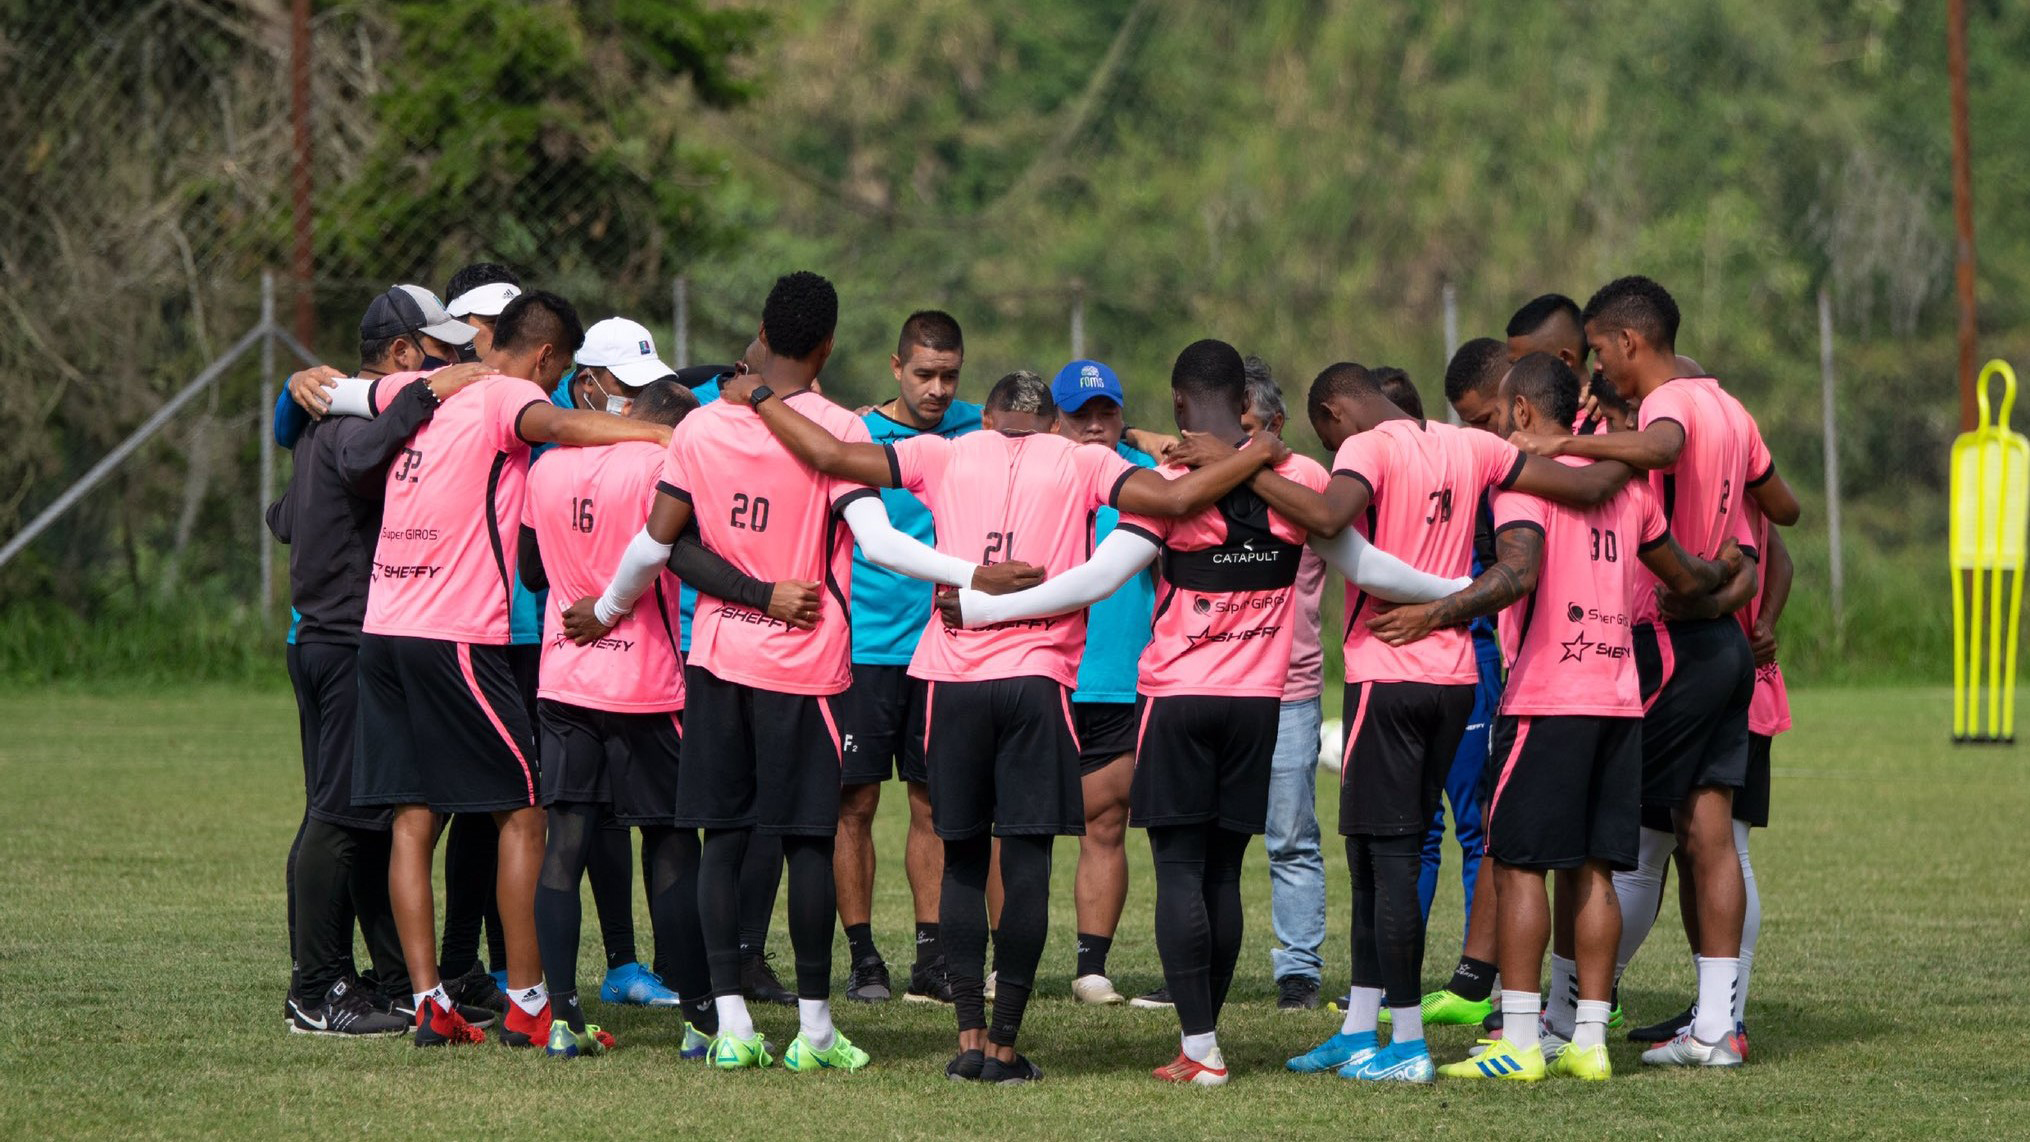 Michael-Ordoñez-Patricio-Perez-Once-Caldas-0-0-Deportivo-Pasto-Casa-Blanca-OC